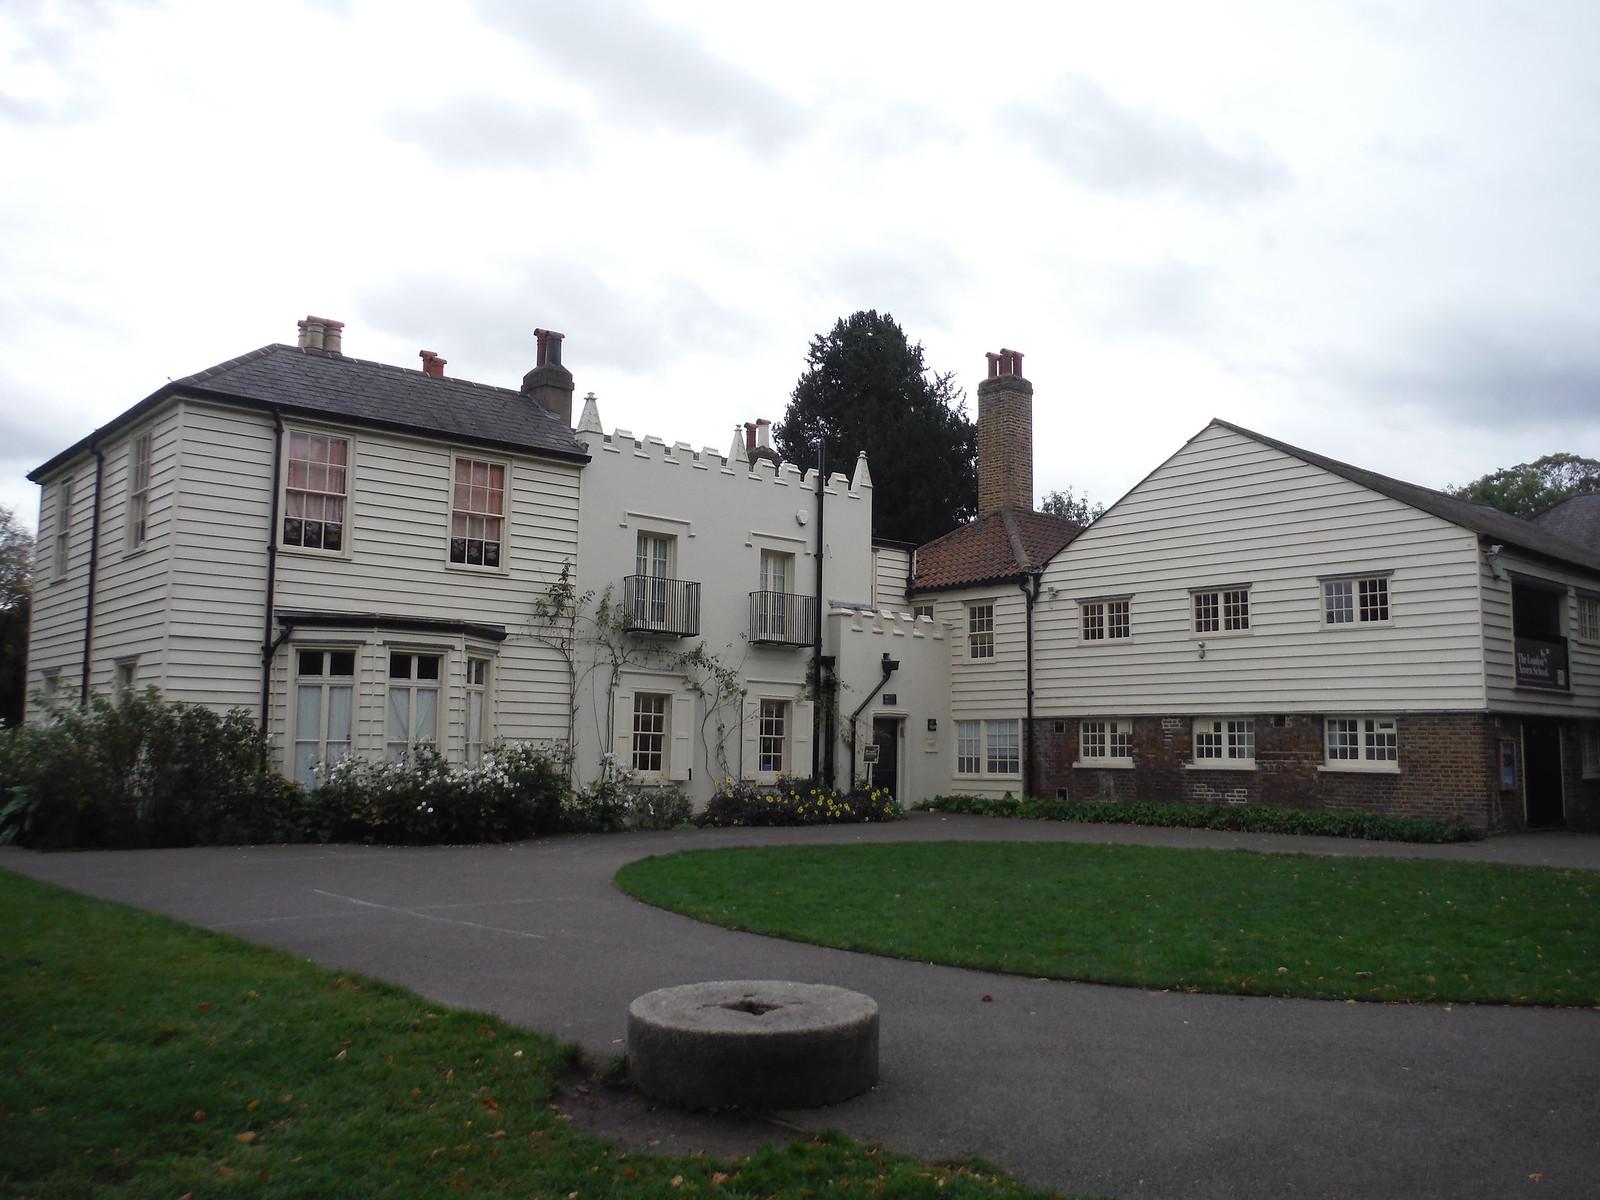 Morden Cottage, Morden Hall Park SWC Walk Short 13 - Morden Hall Park and Merton Abbey Mills